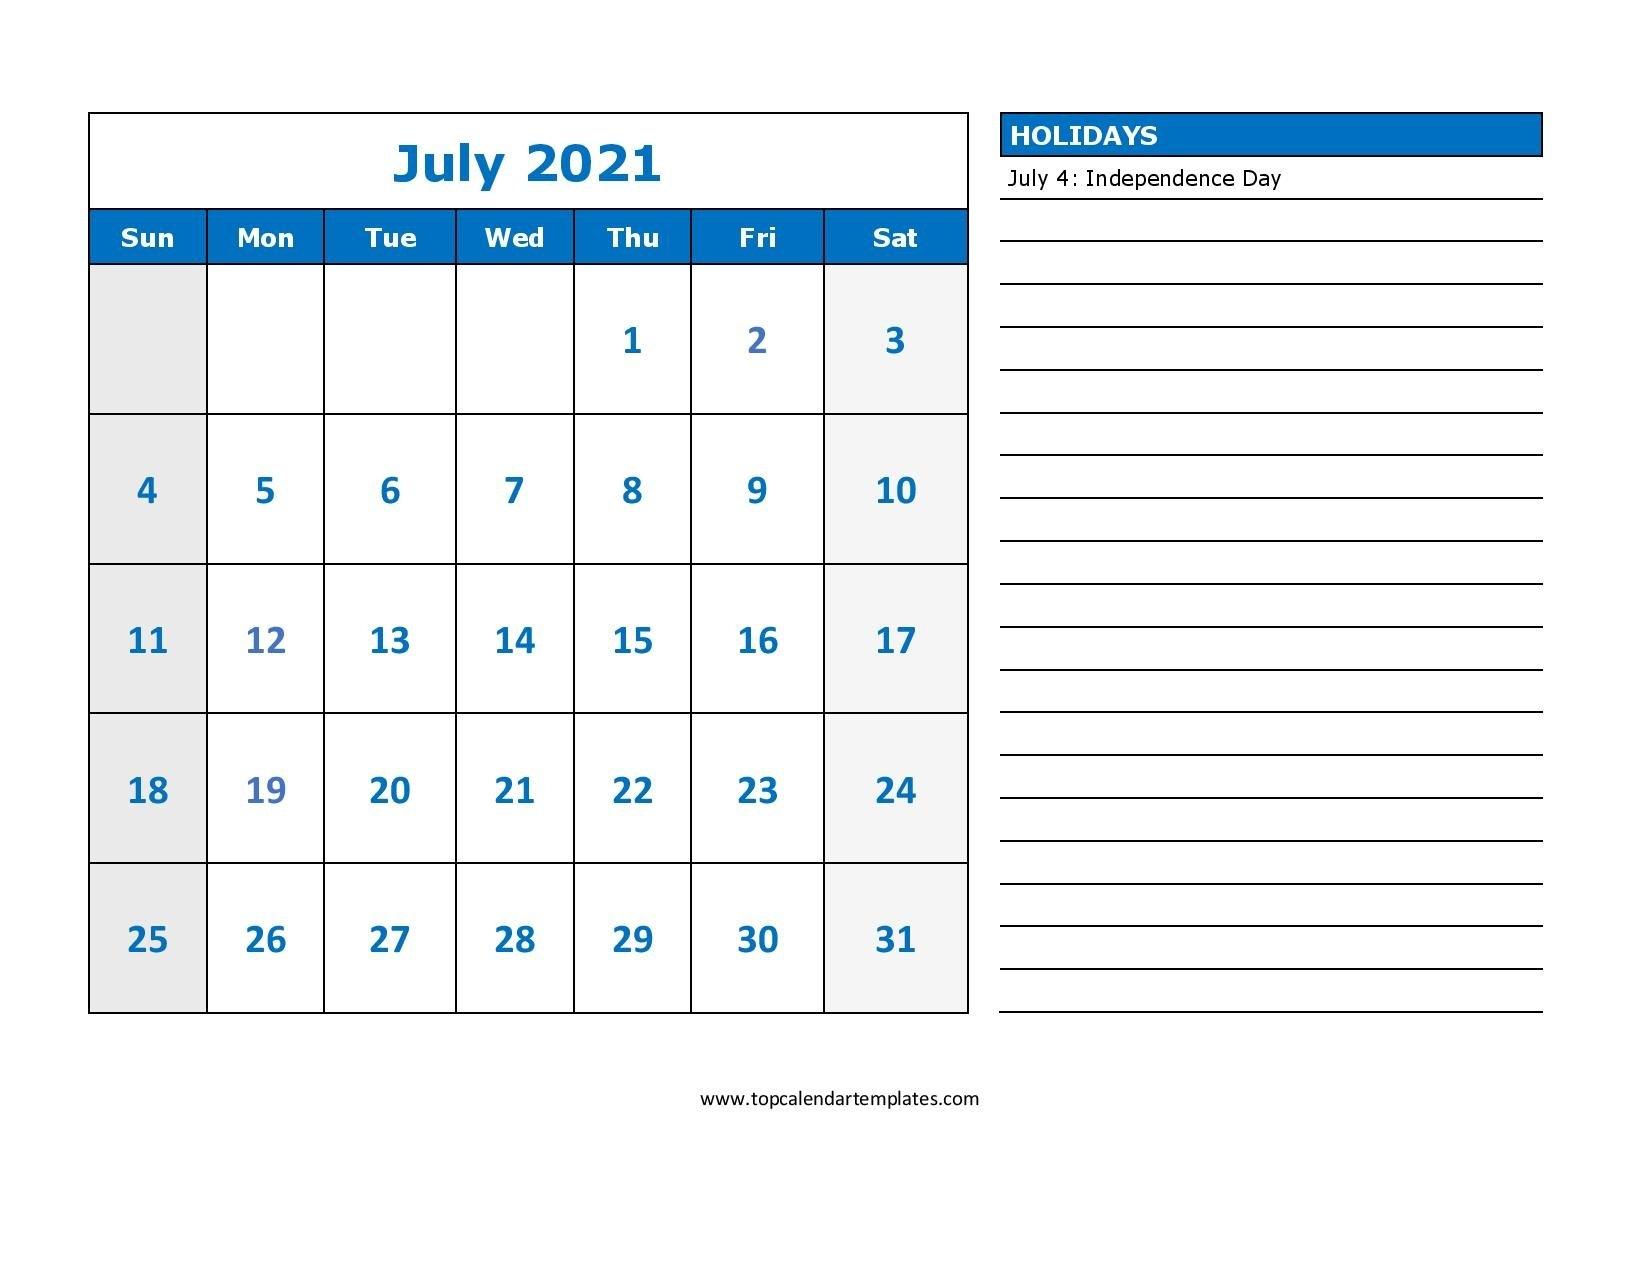 Printable July 2021 Calendar Template - Pdf, Word, Excel throughout Printable Interactive 2021 Calendar Graphics